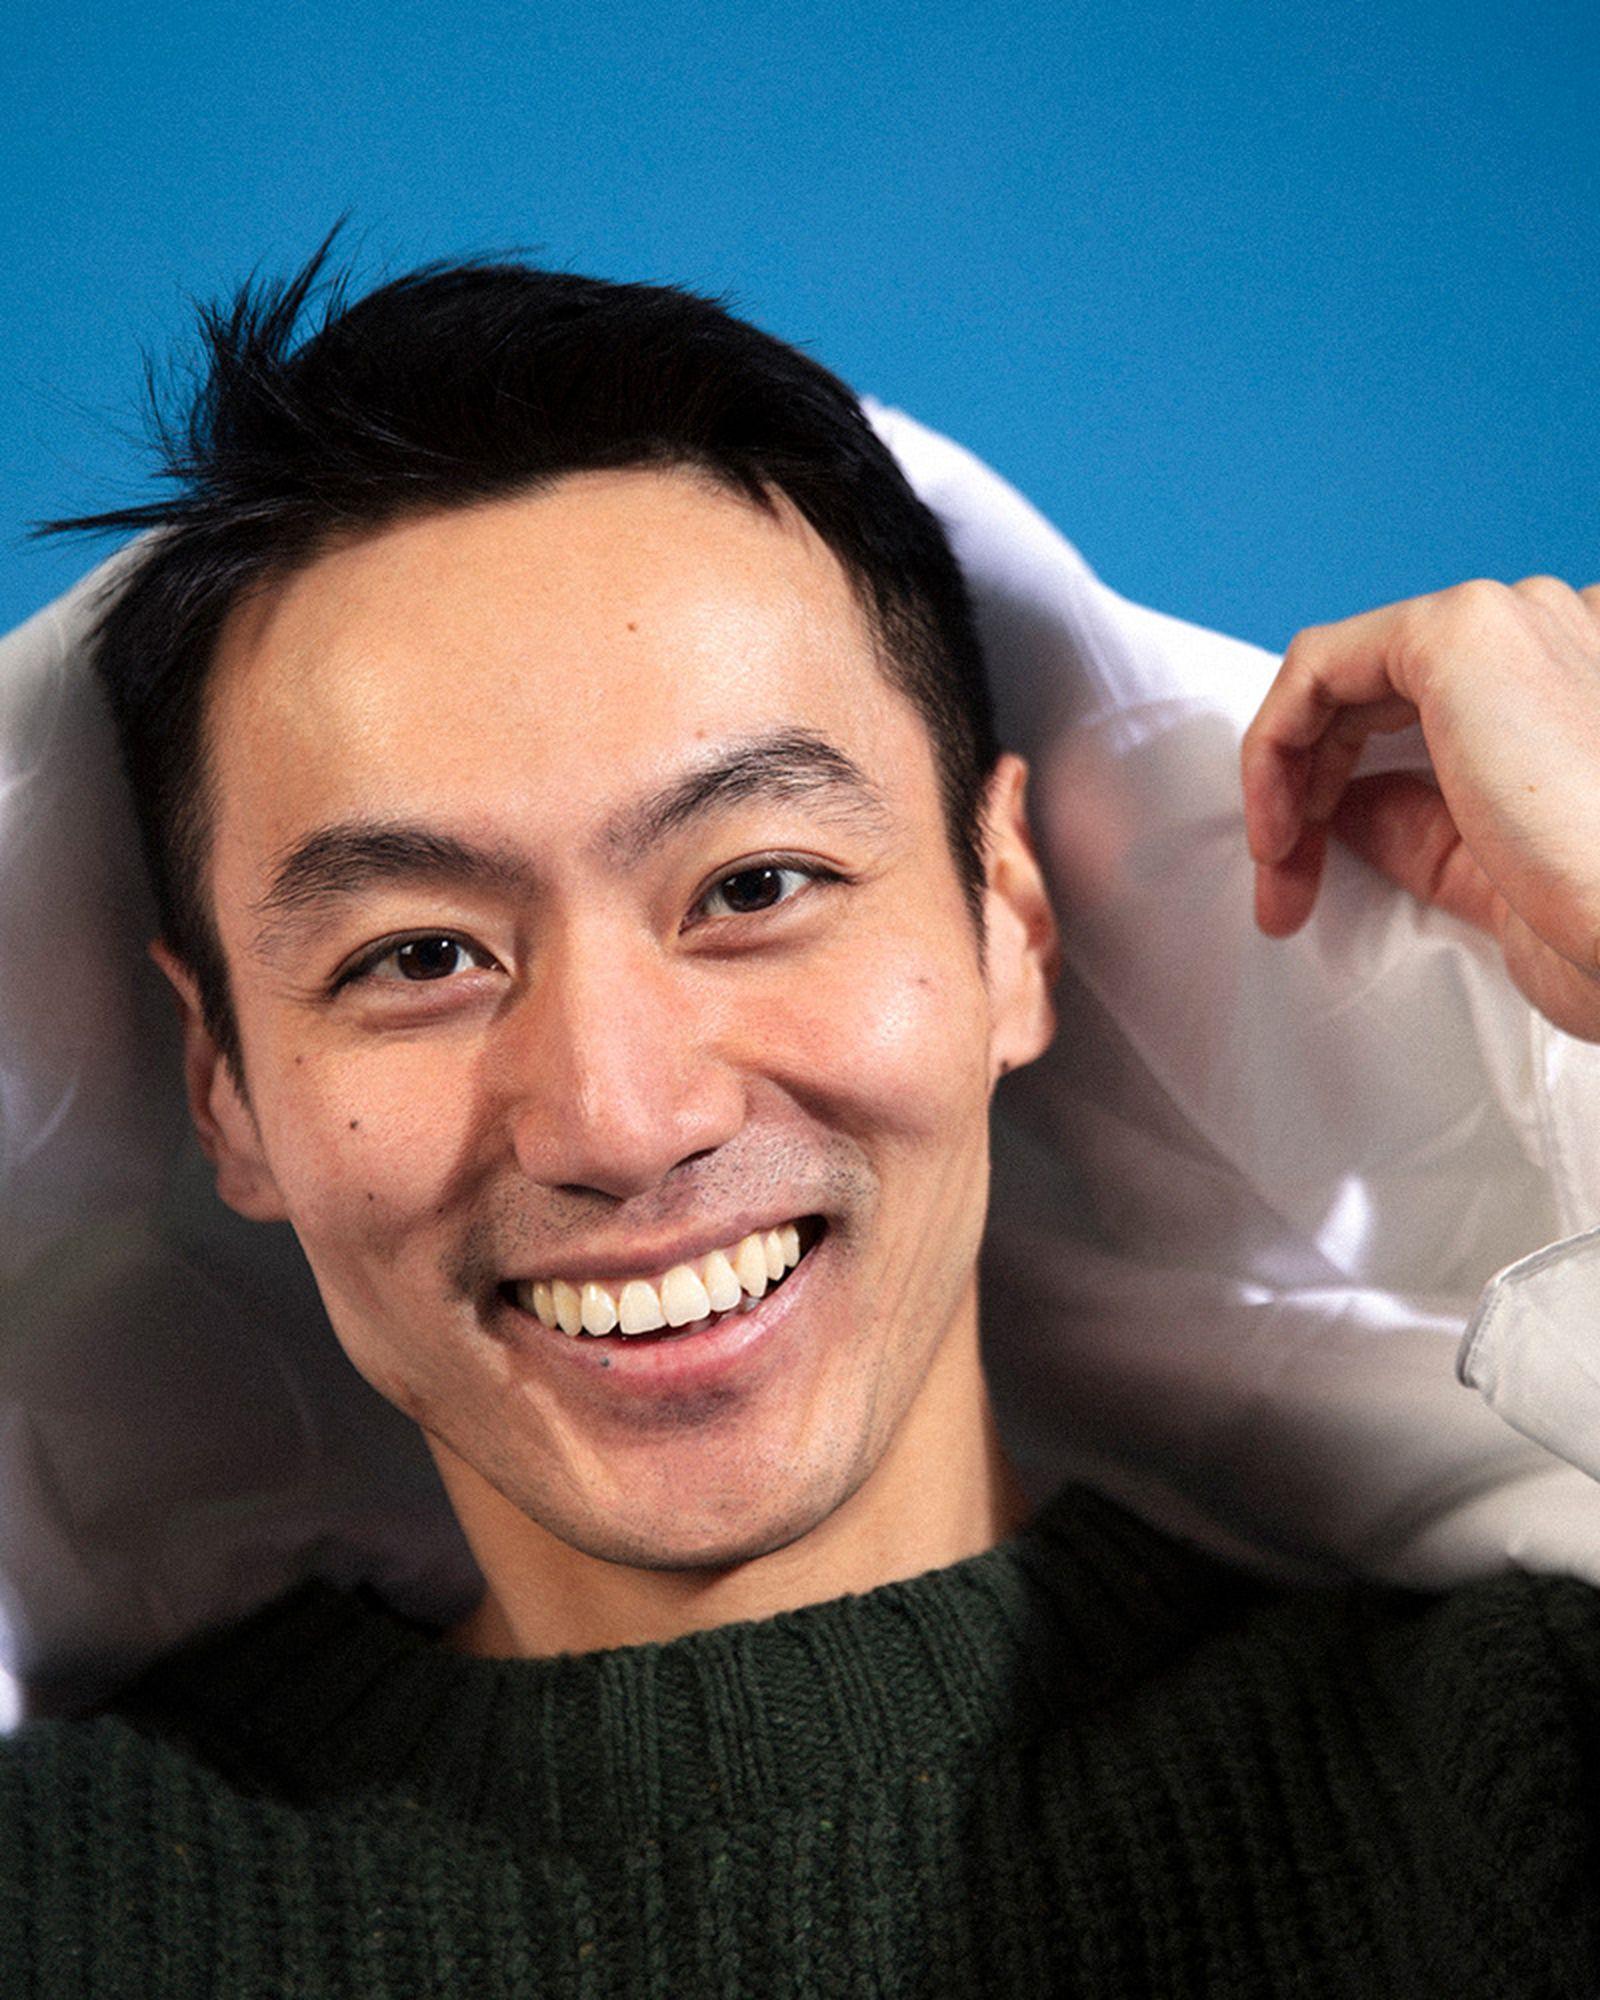 leo-wang-buffy-life-coach-bed-hygiene-02